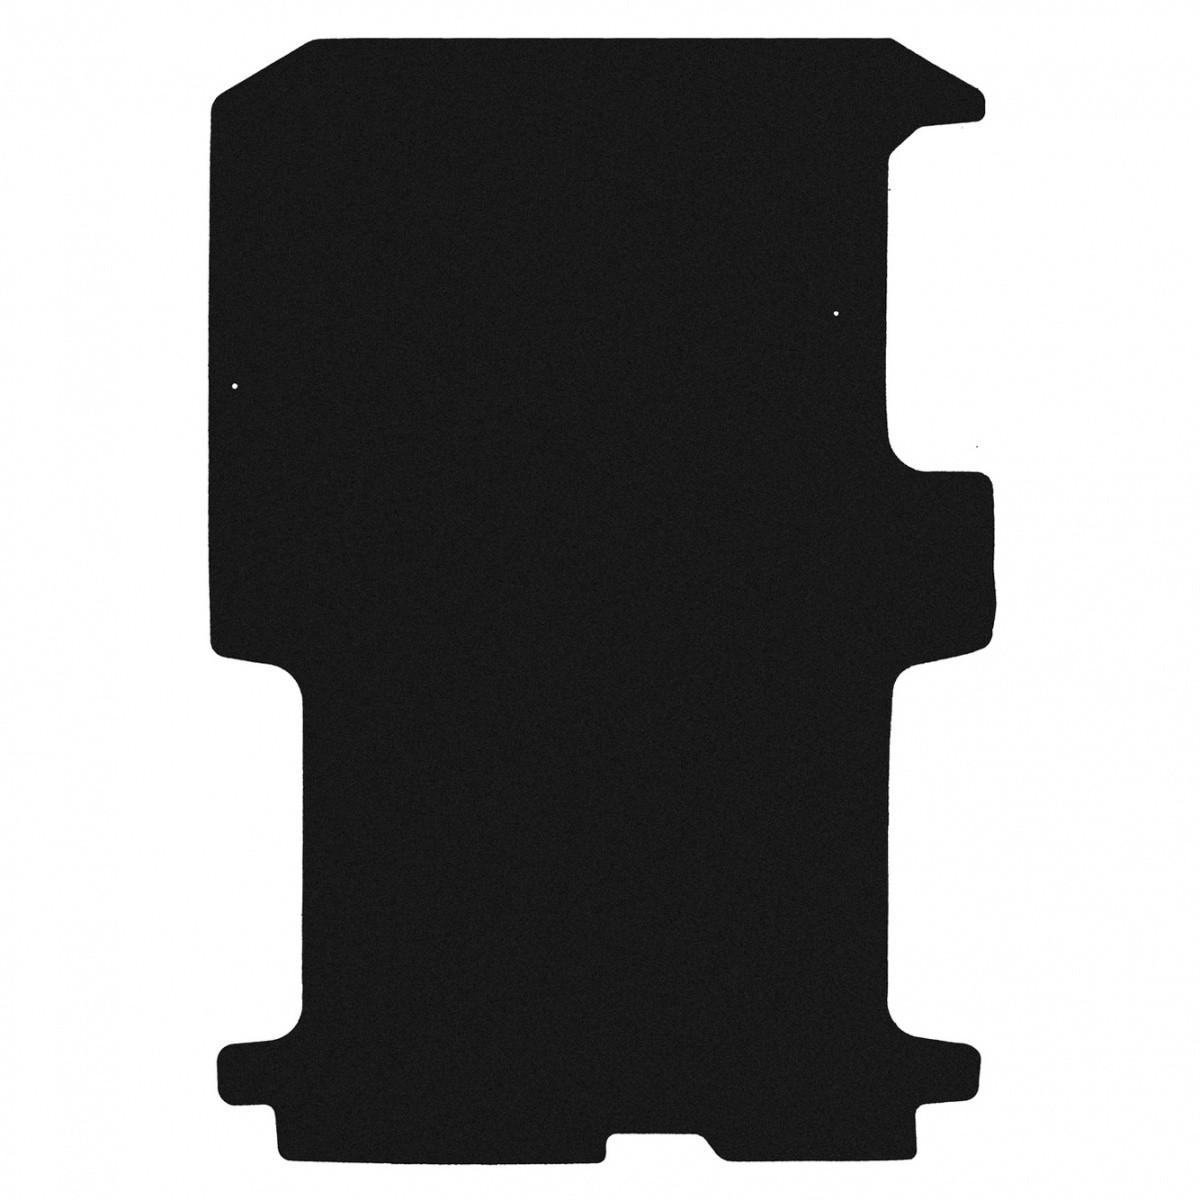 Vložka Renault Trafic 2001-2014 (L1)